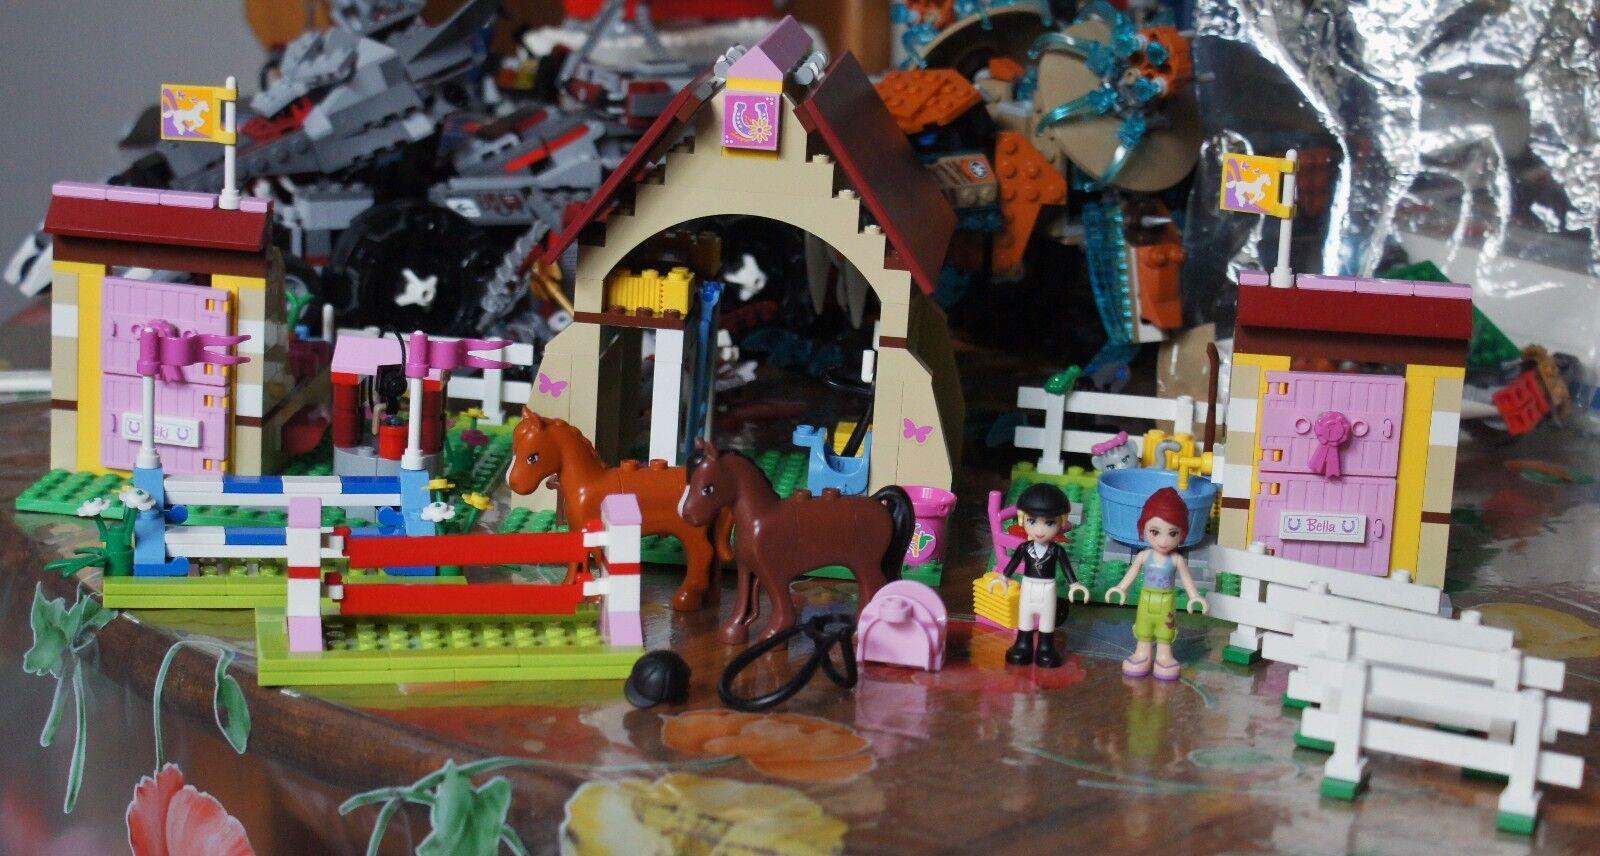 Lego Friends 3189 Les écuries de Heartlake Heartlake Heartlake City Stables 1fbdd9